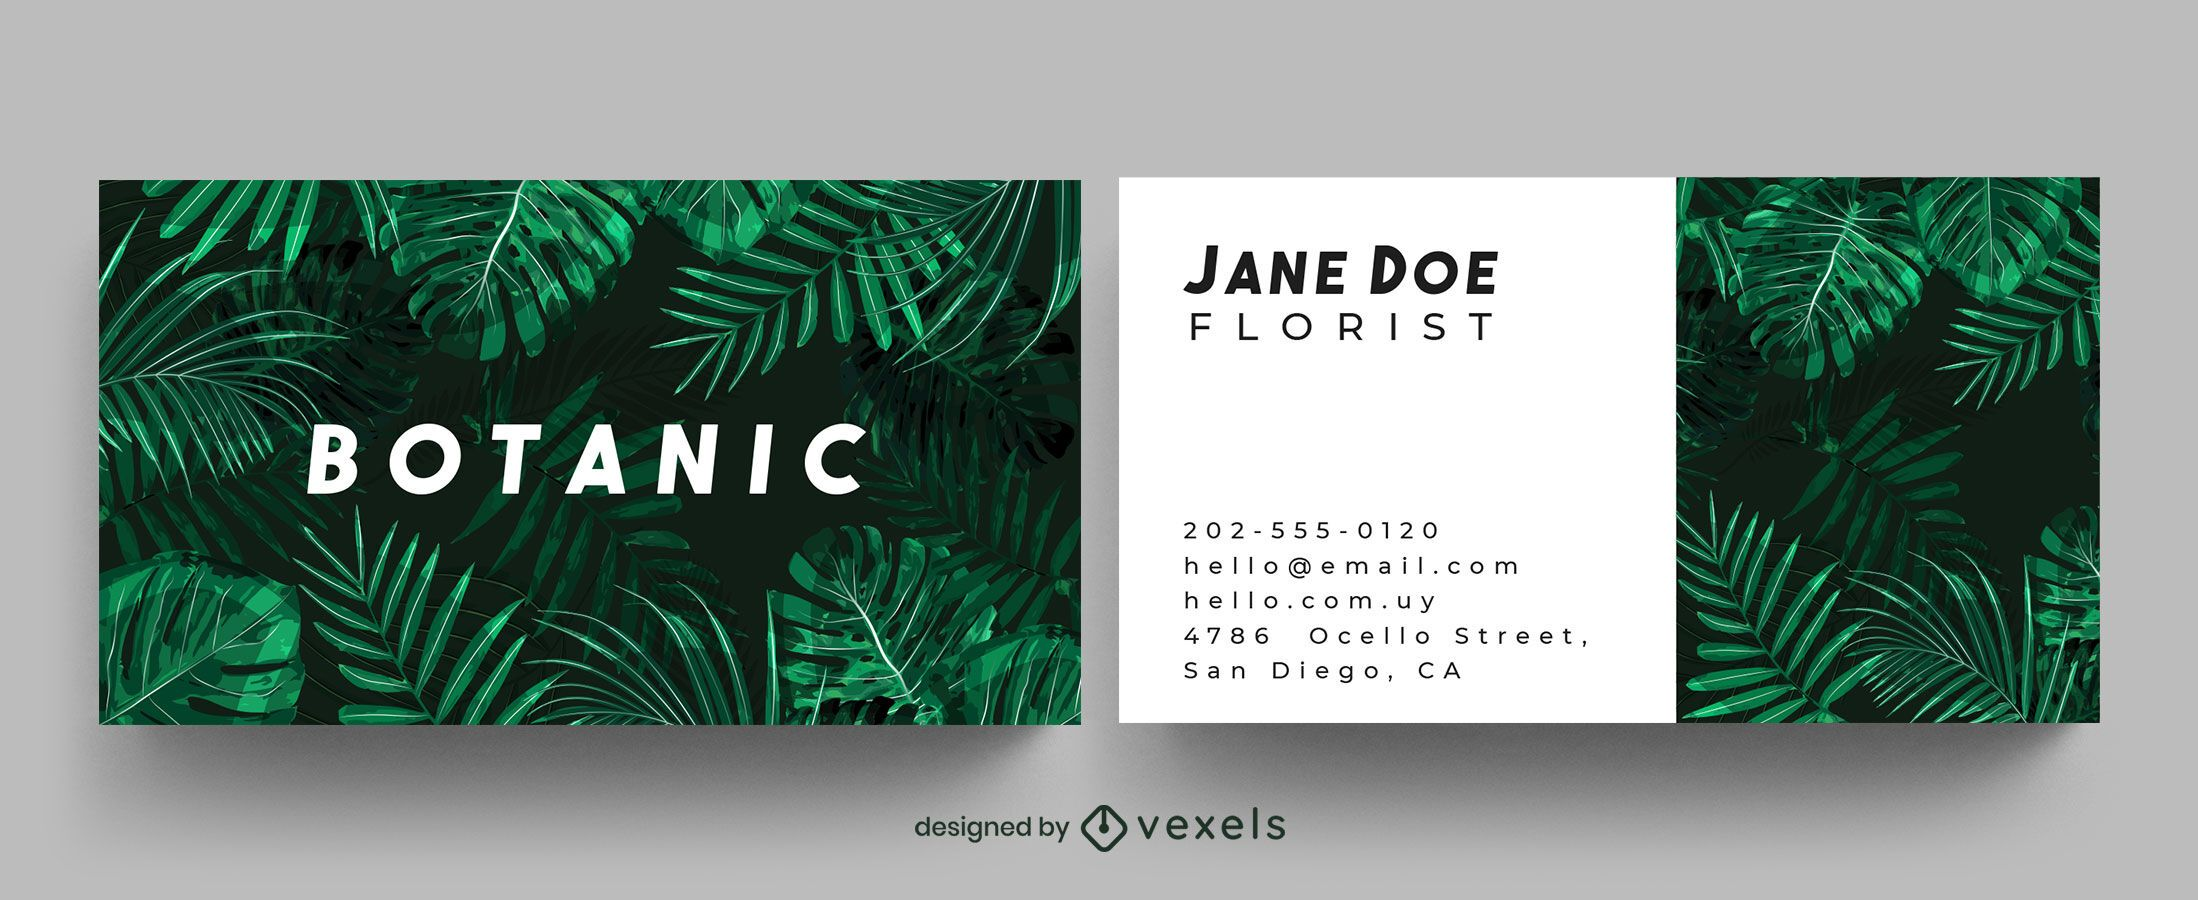 Diseño de tarjeta de visita de selva botánica.